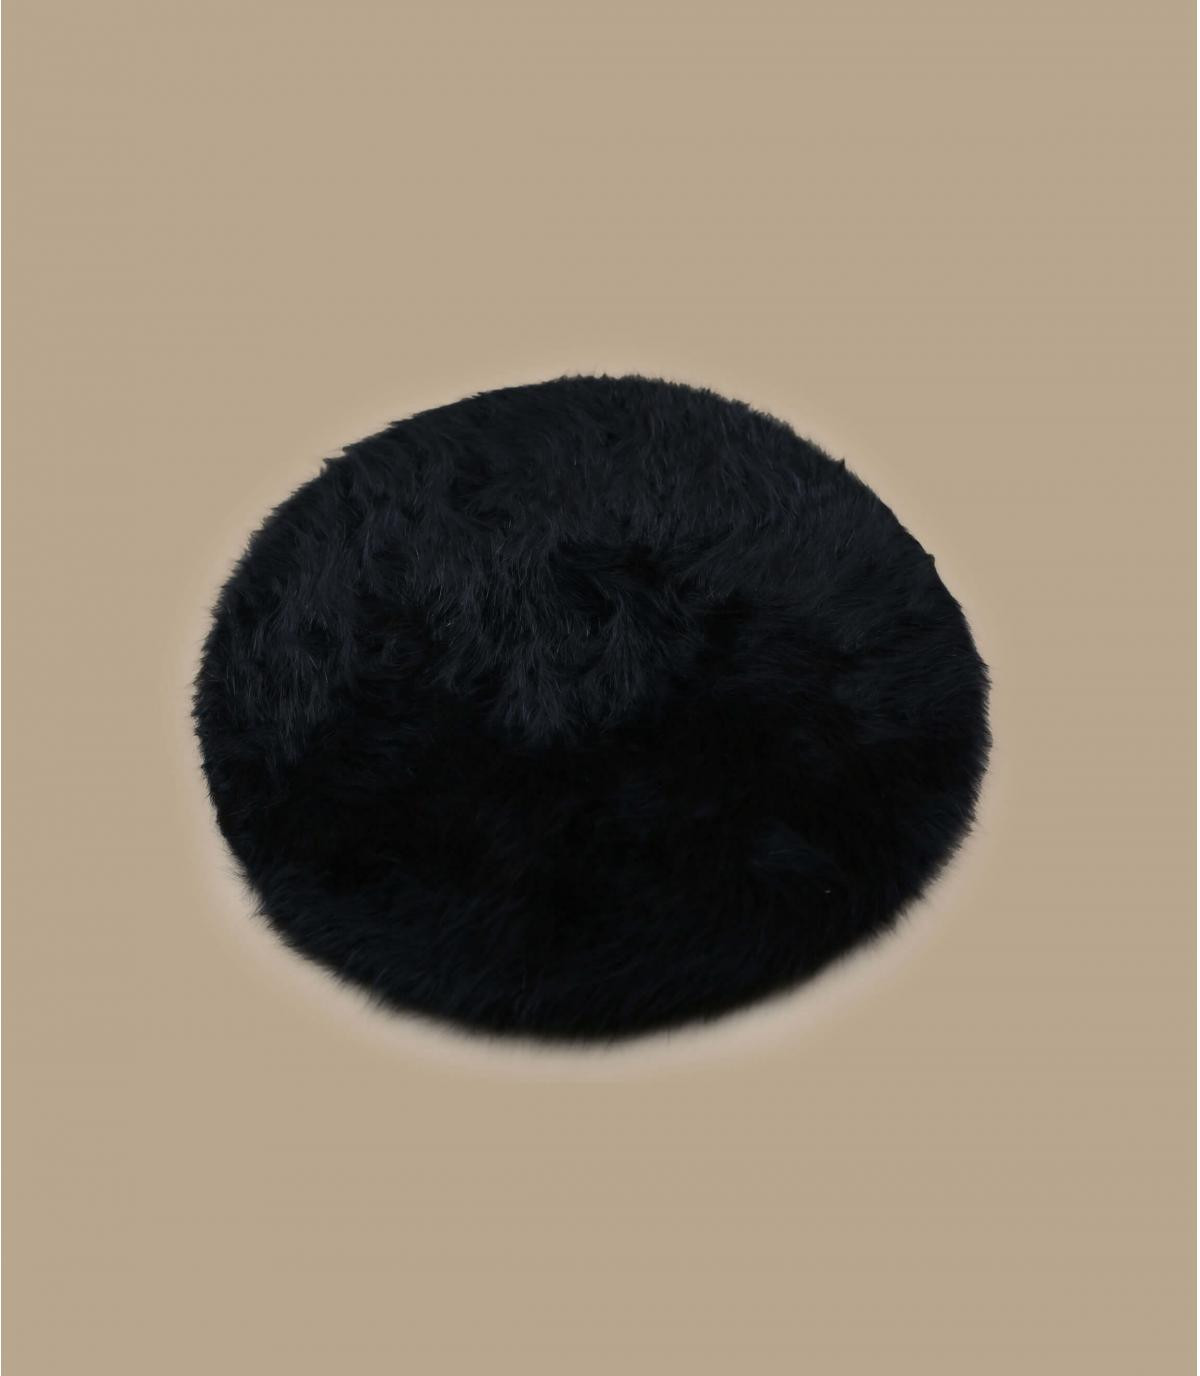 Detalles Boina angora negra imagen 2